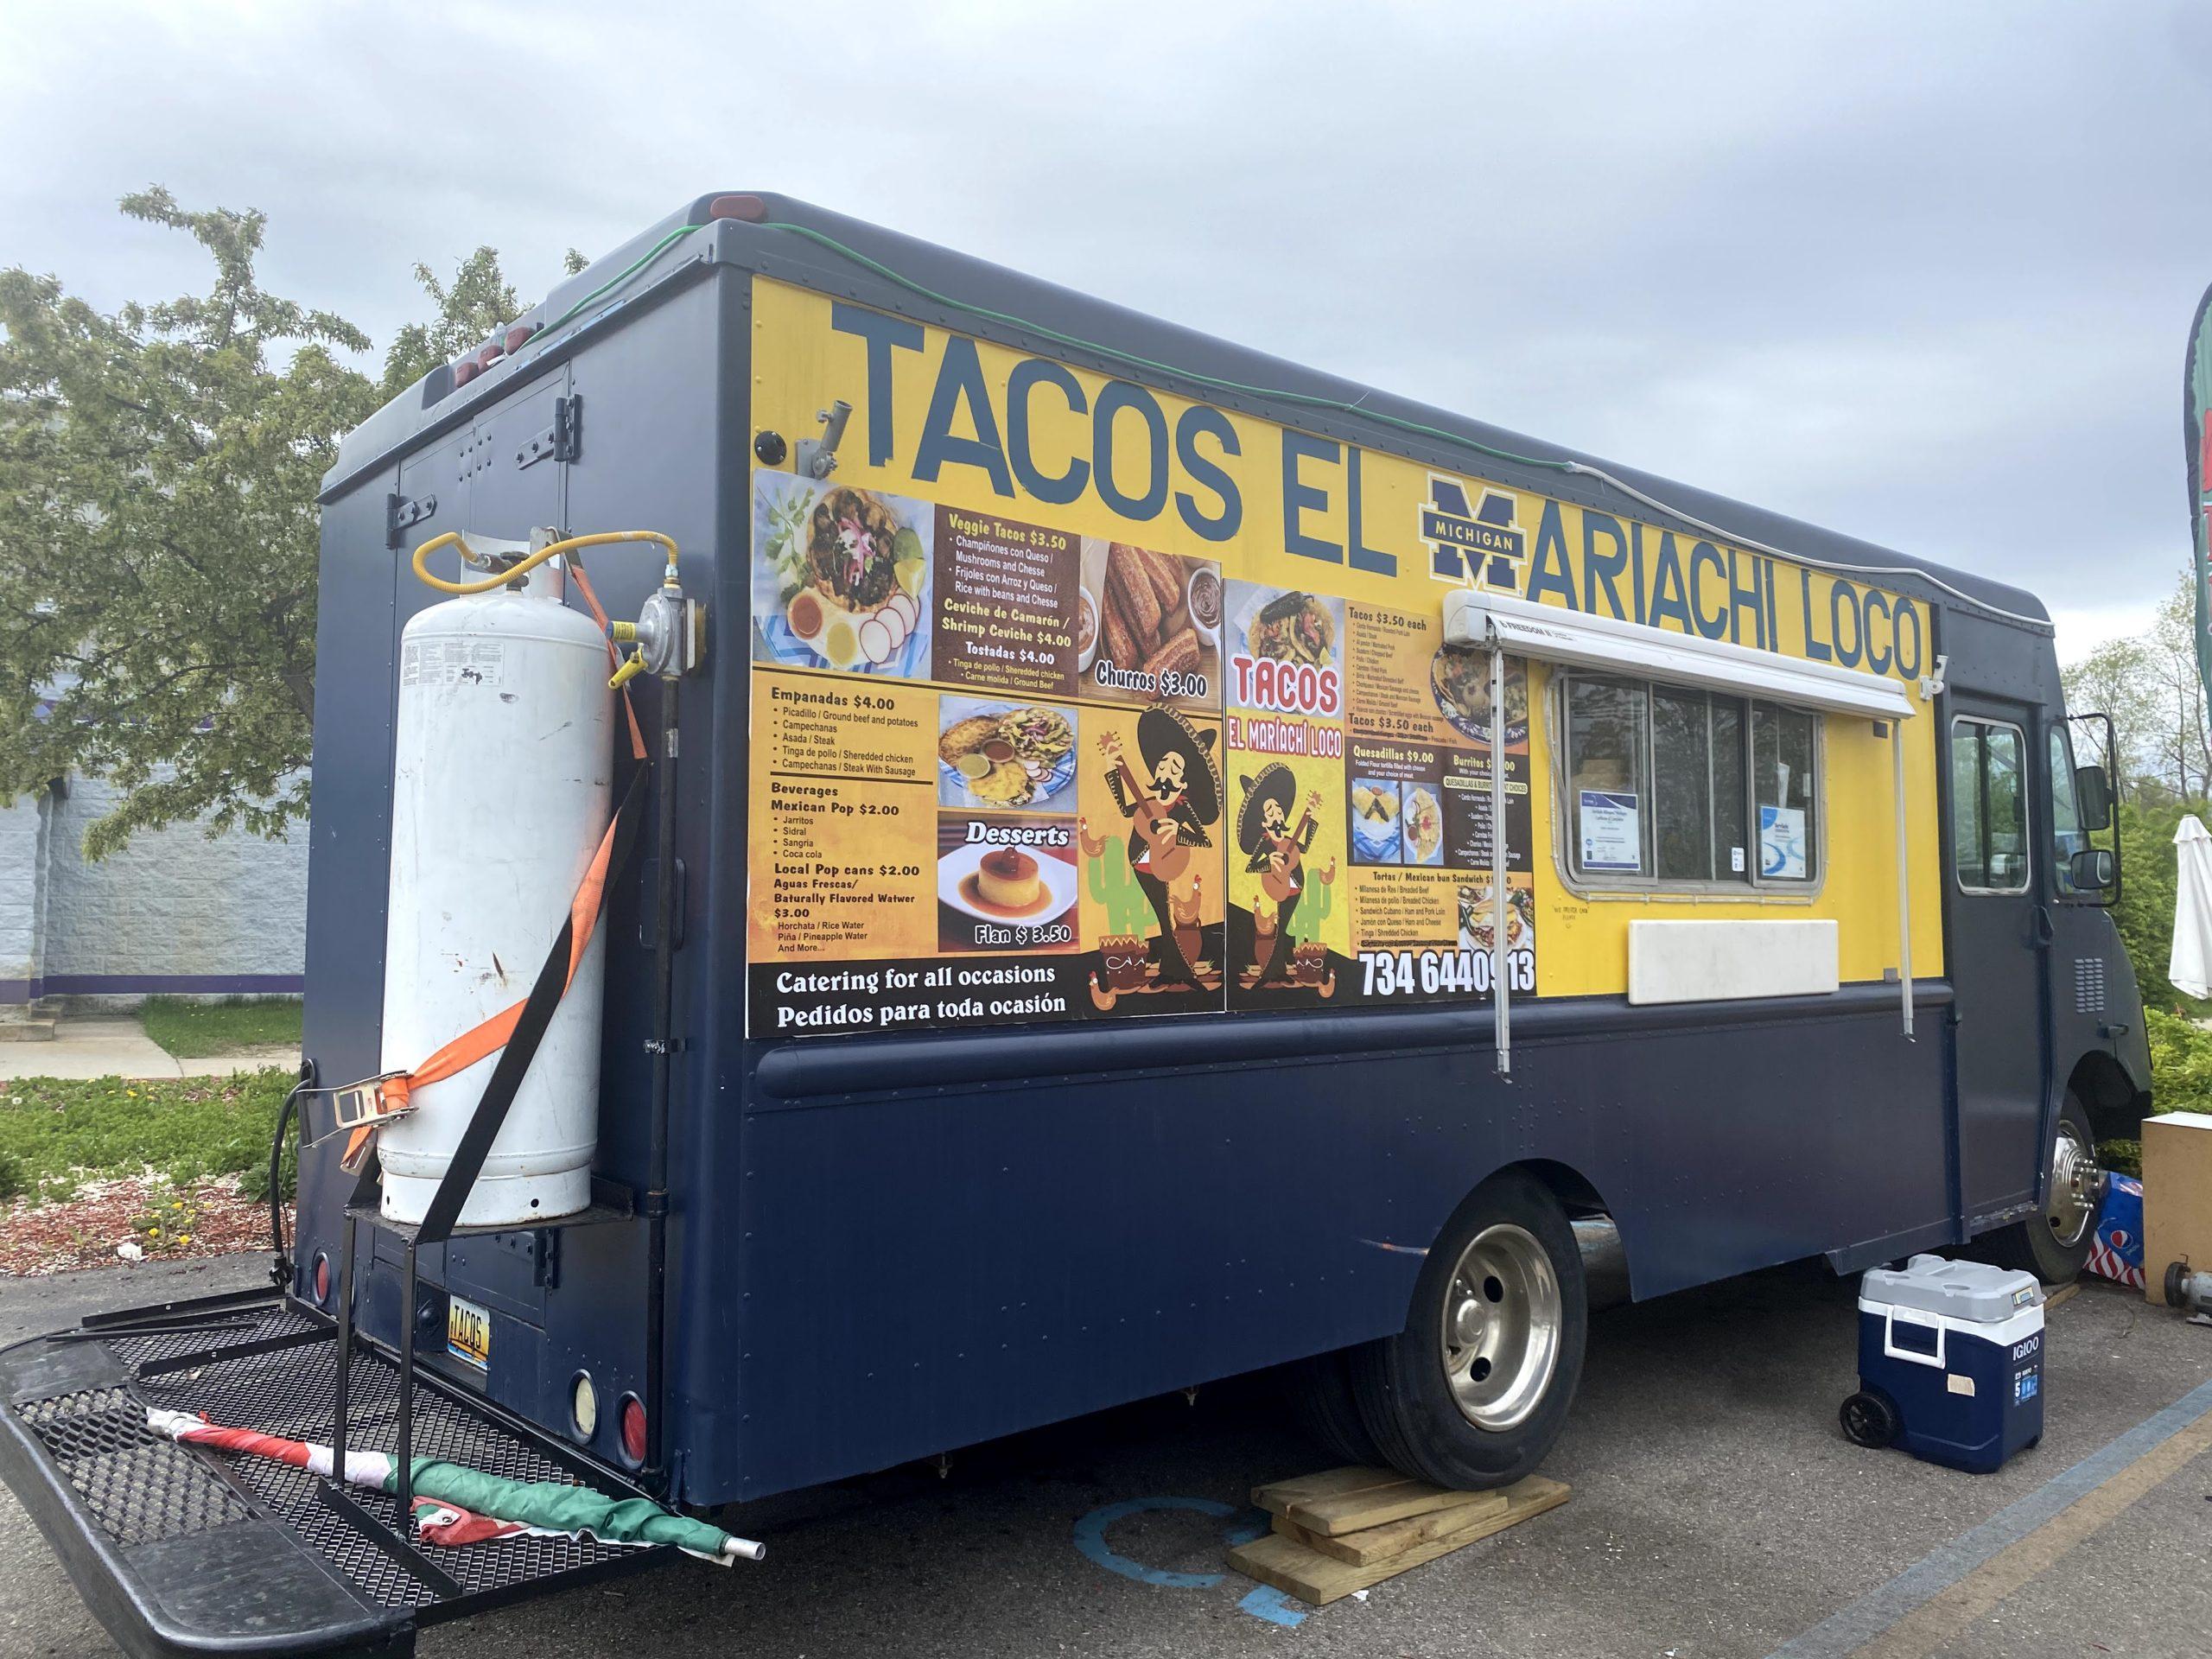 Washtenaw County Food truck